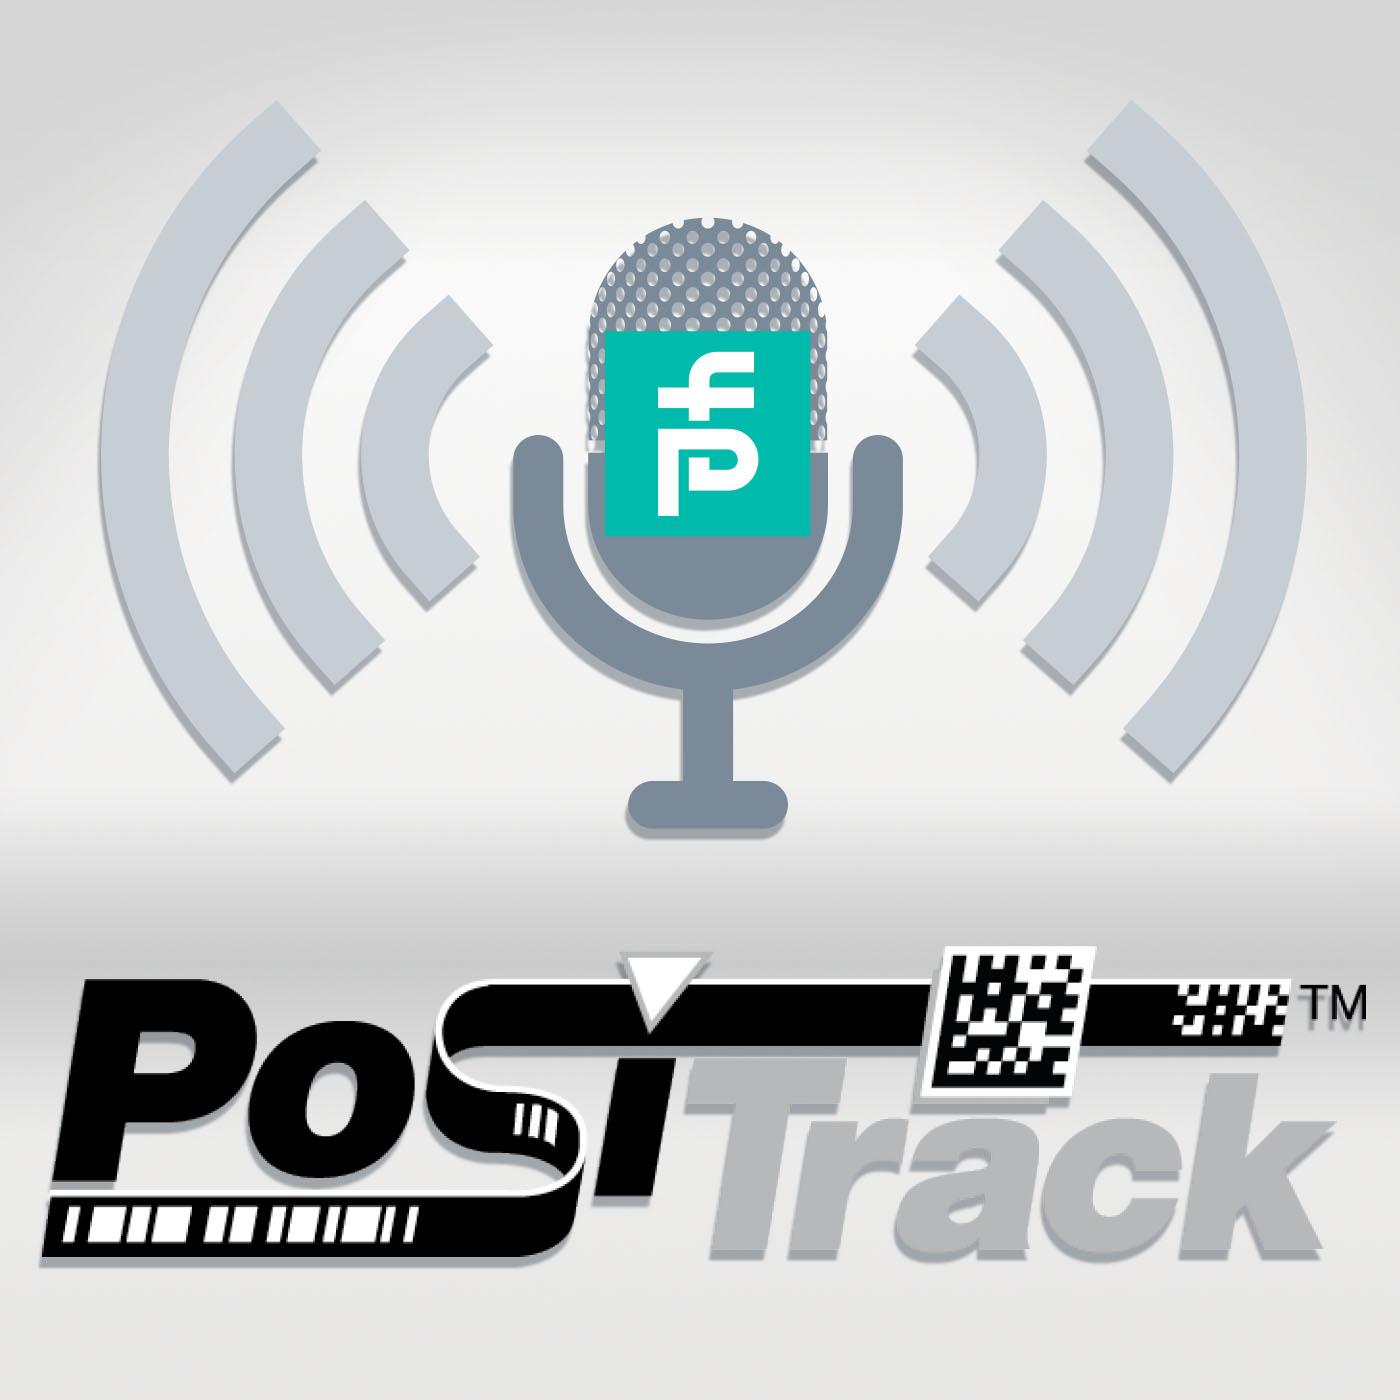 Pepperl+Fuchs PosiTrack Talk